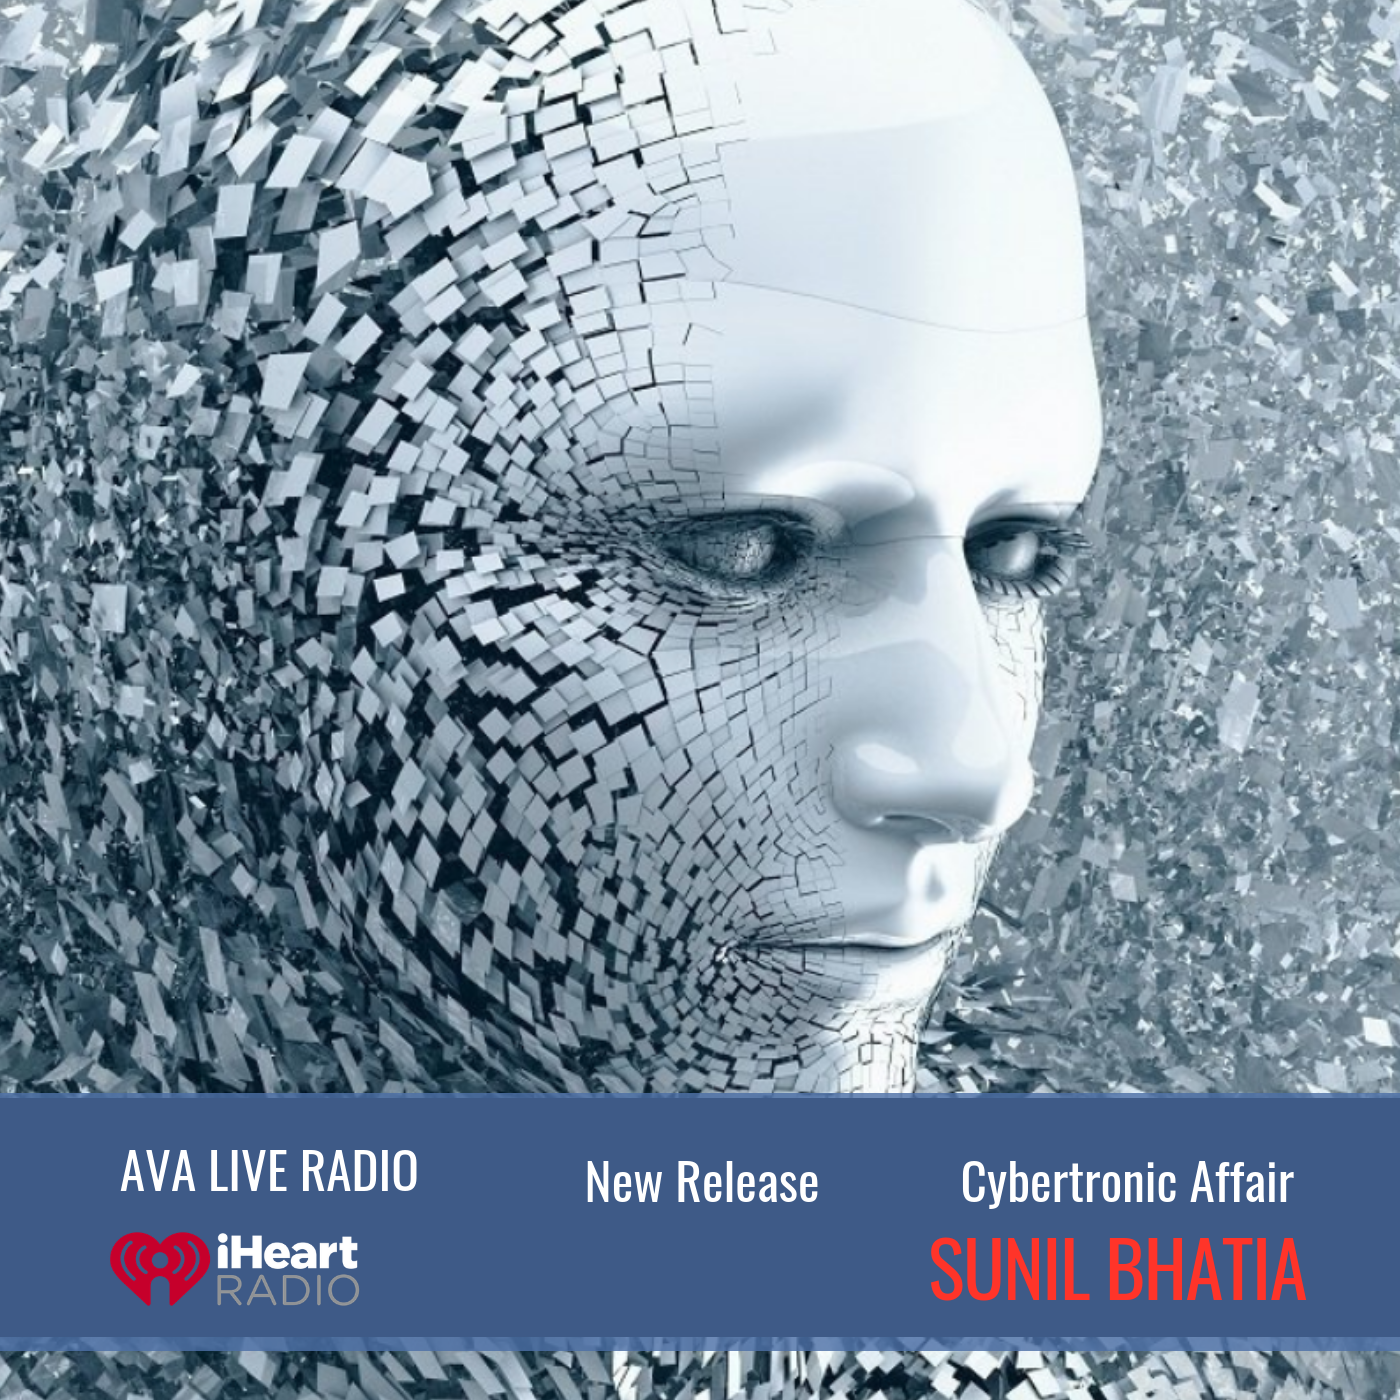 Cybertronic Affair ava sunil bhatia.png